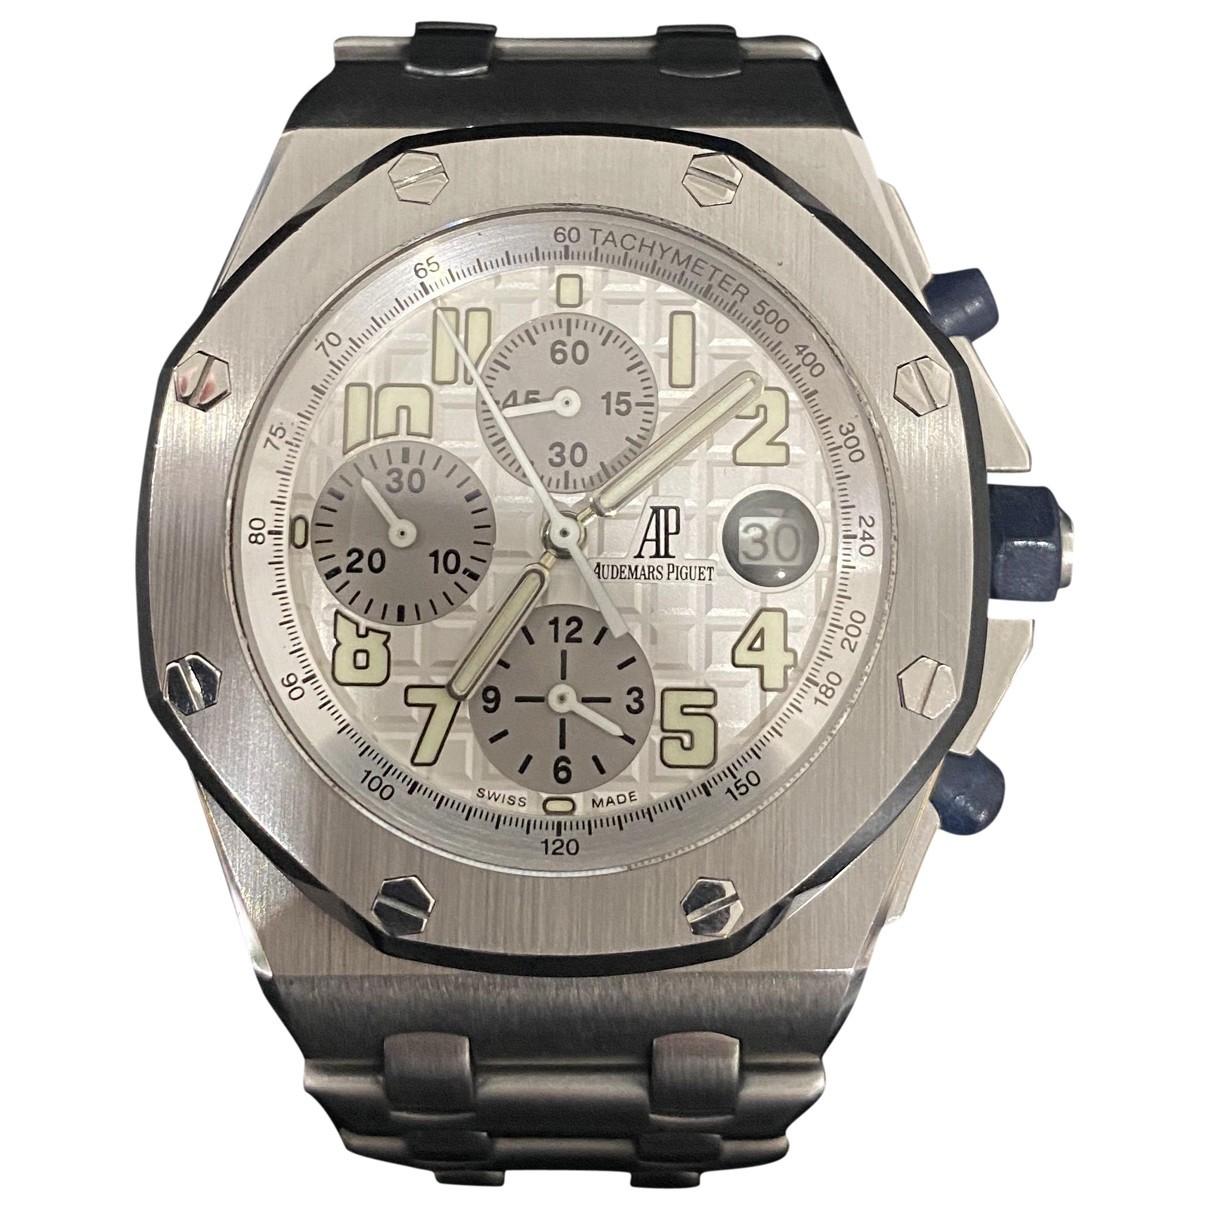 Audemars Piguet Royal Oak Offshore Uhr in  Silber Stahl